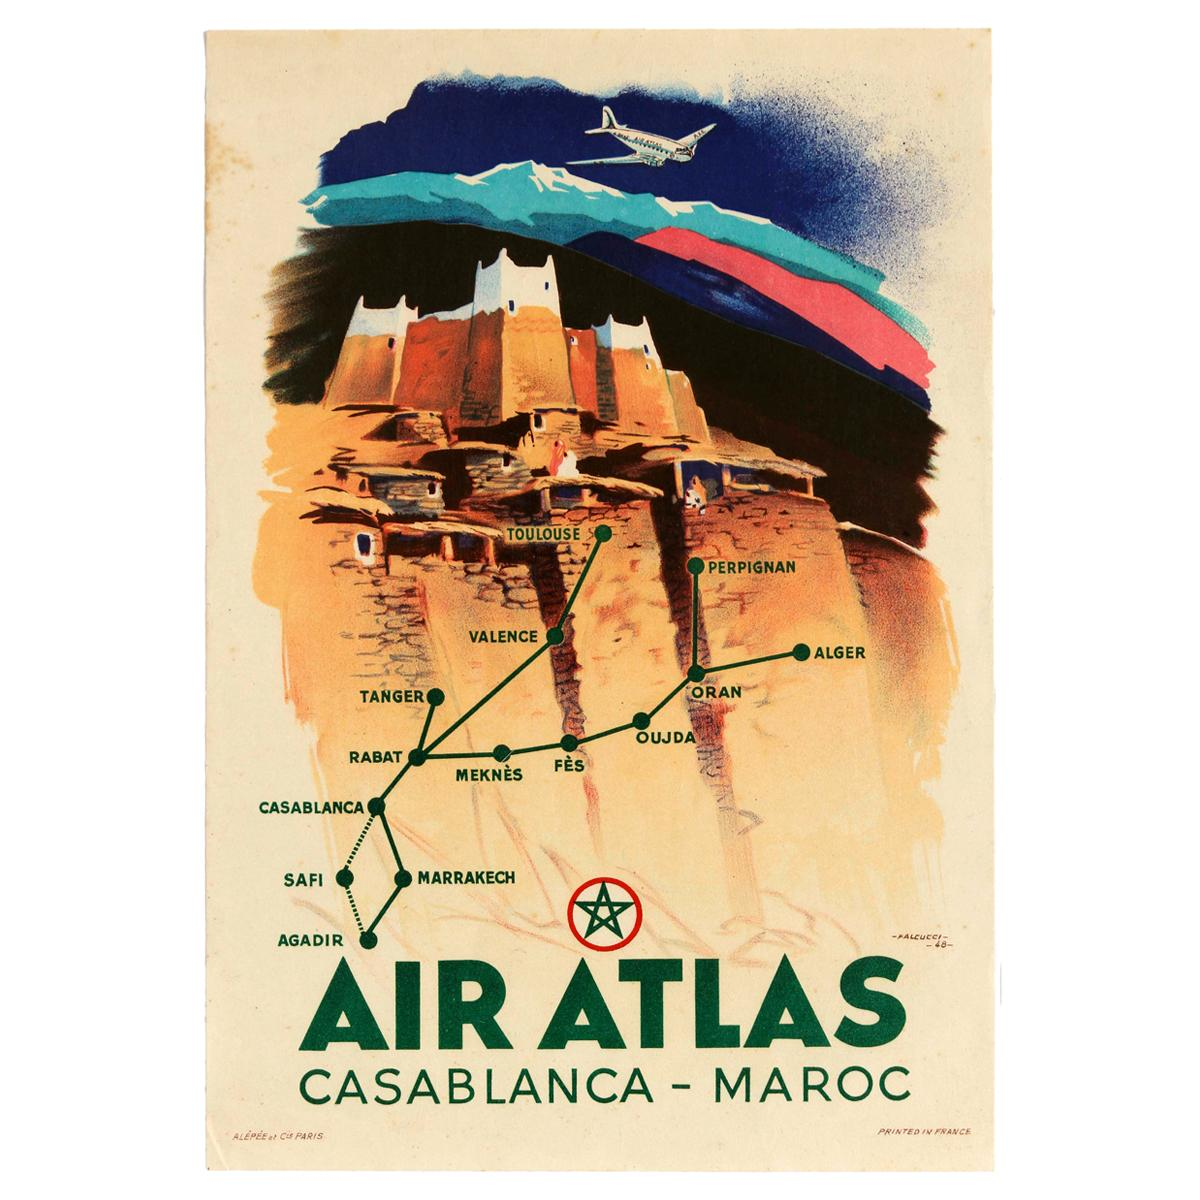 Original Vintage Poster Air Atlas Mountains Travel Map Casablanca Morocco Maroc